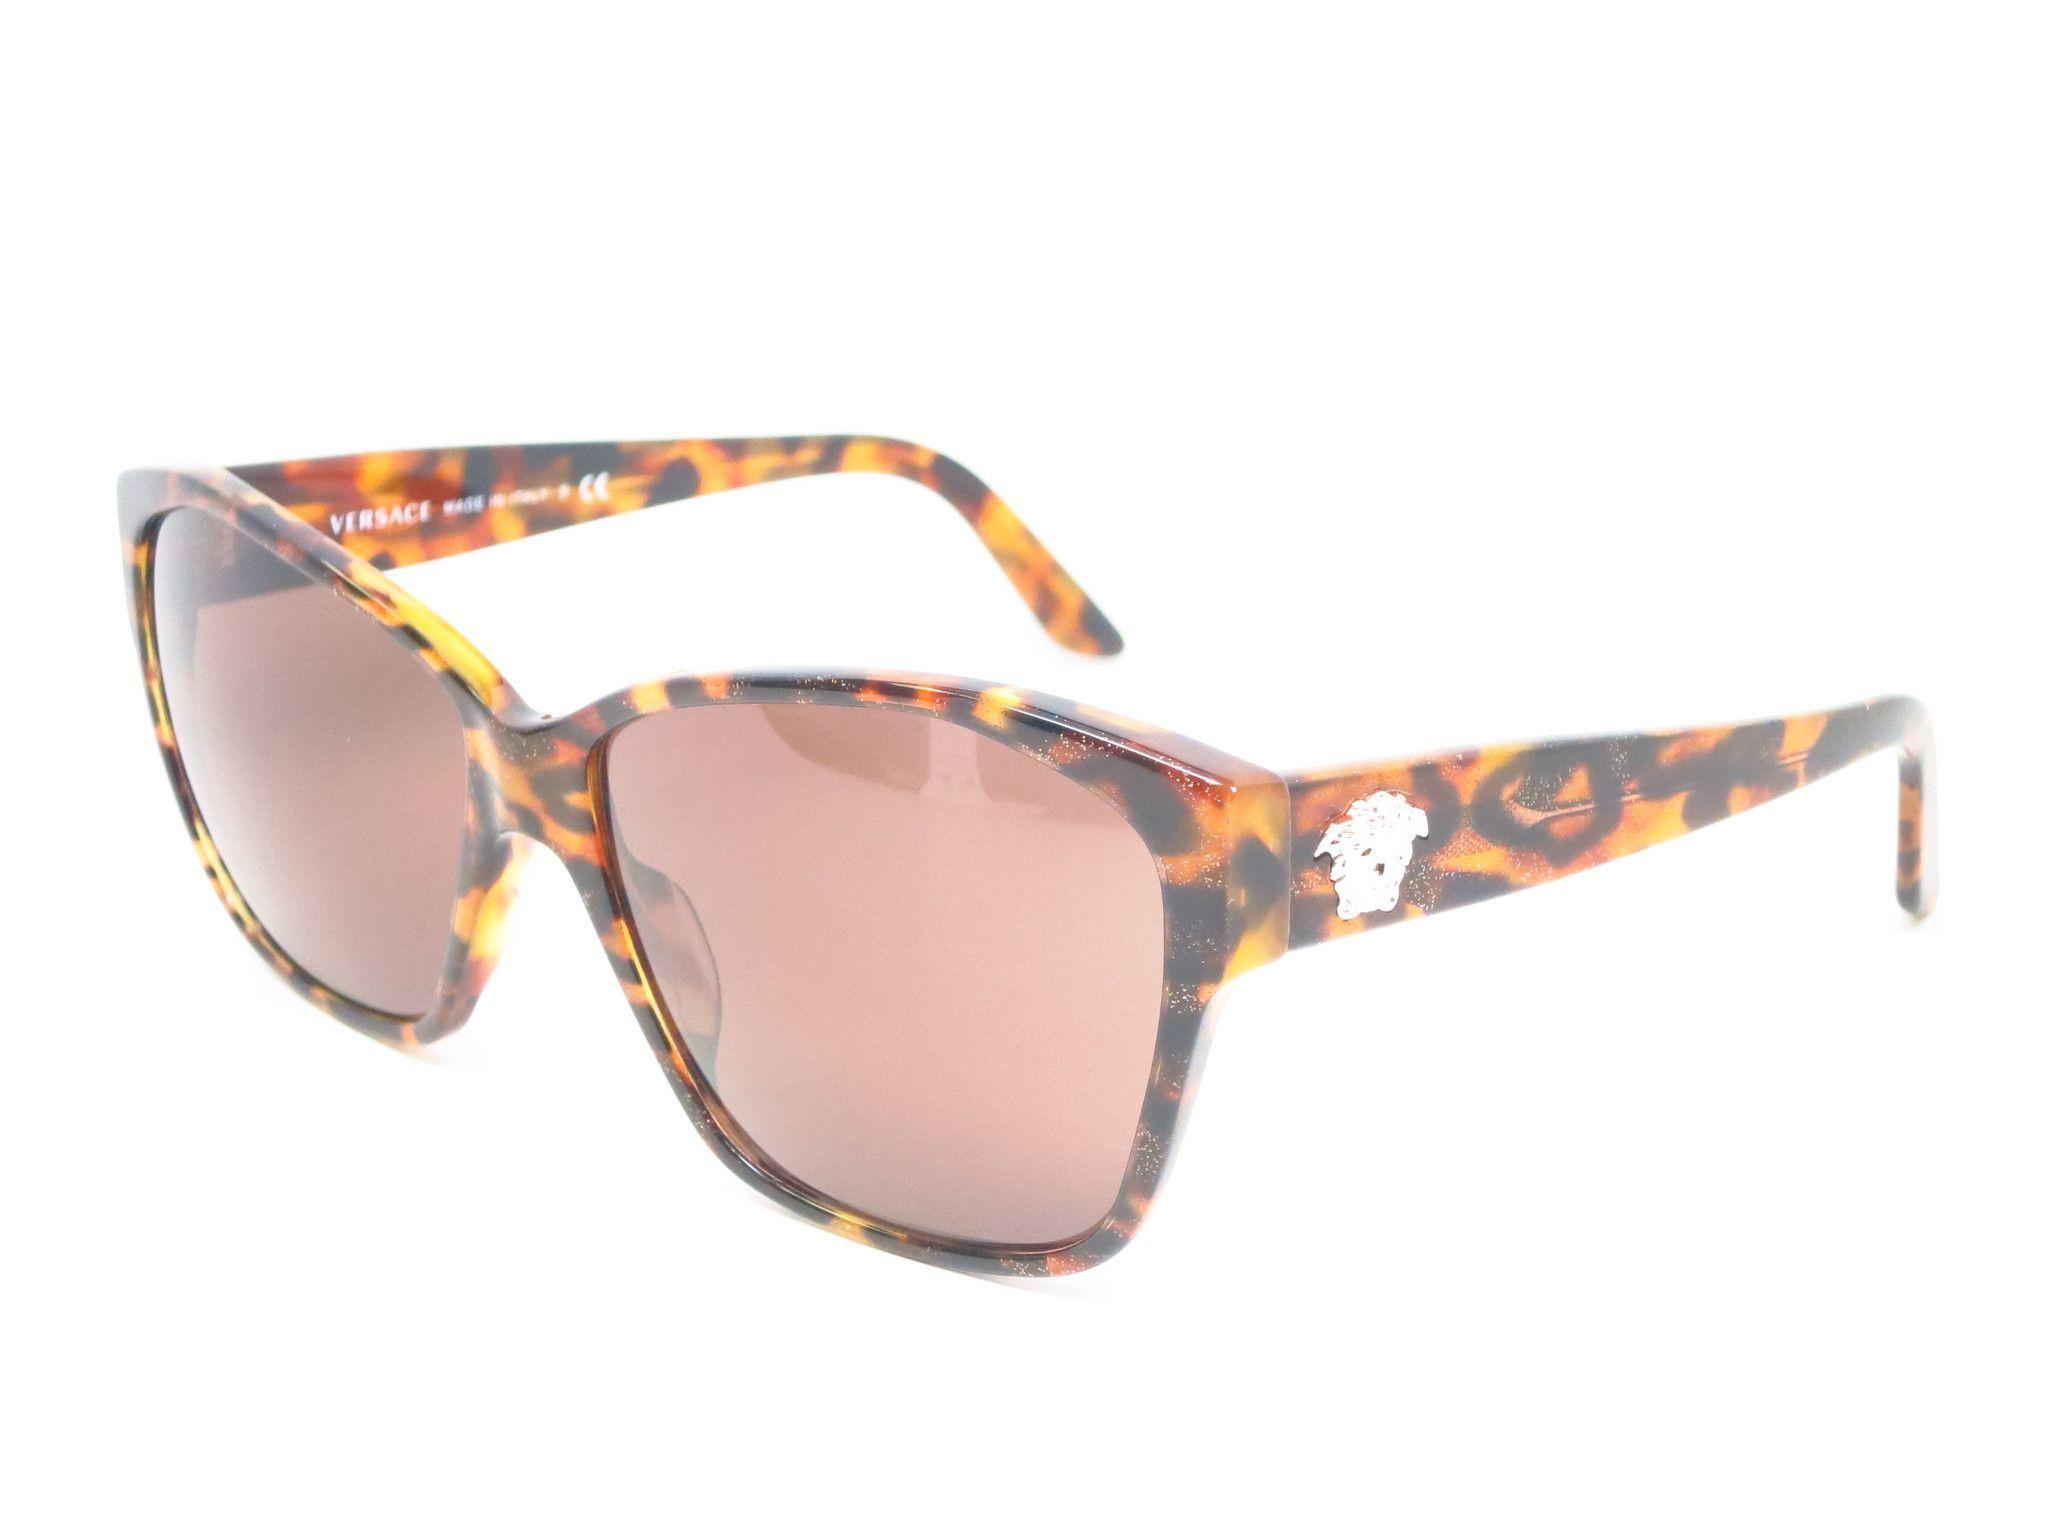 d3450182e7 Versace VE 4277 Animalier Brown Havana 5115 13 Sunglasses